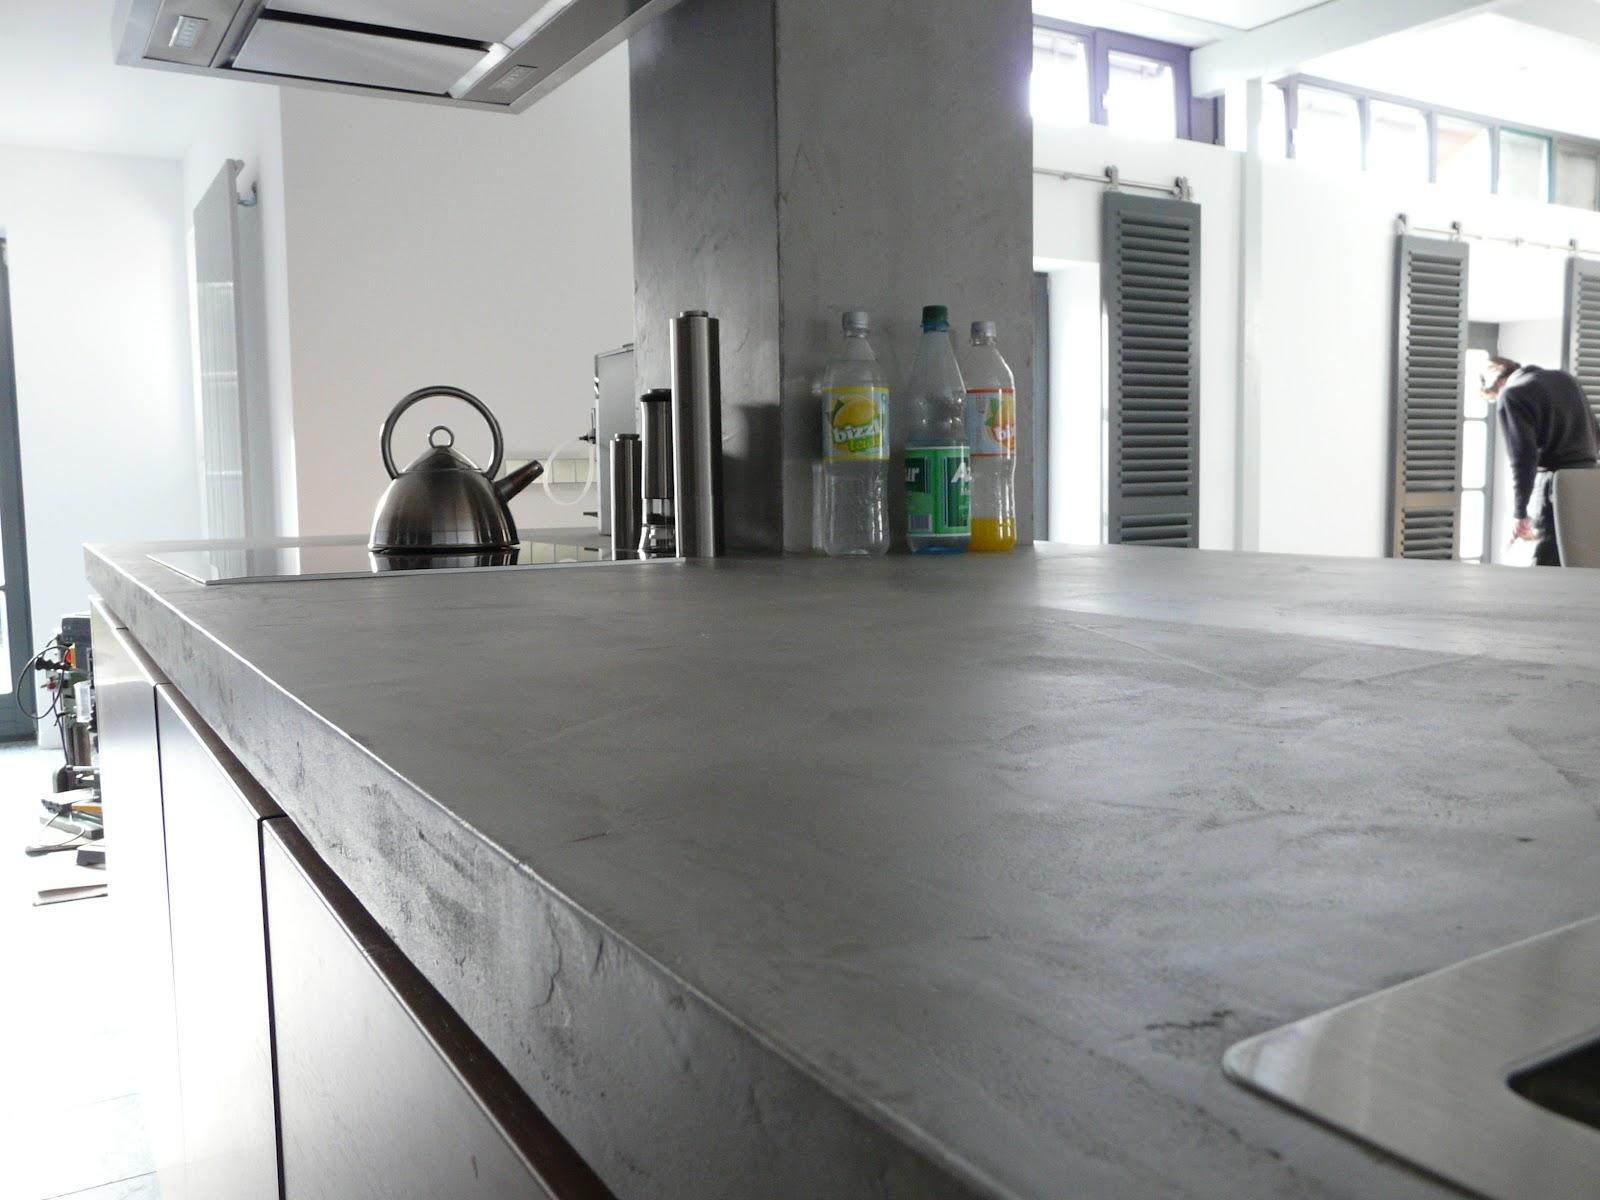 Beton Arbeitsplatte Kuche Kuche L Beton Produkt Harr Beton Design